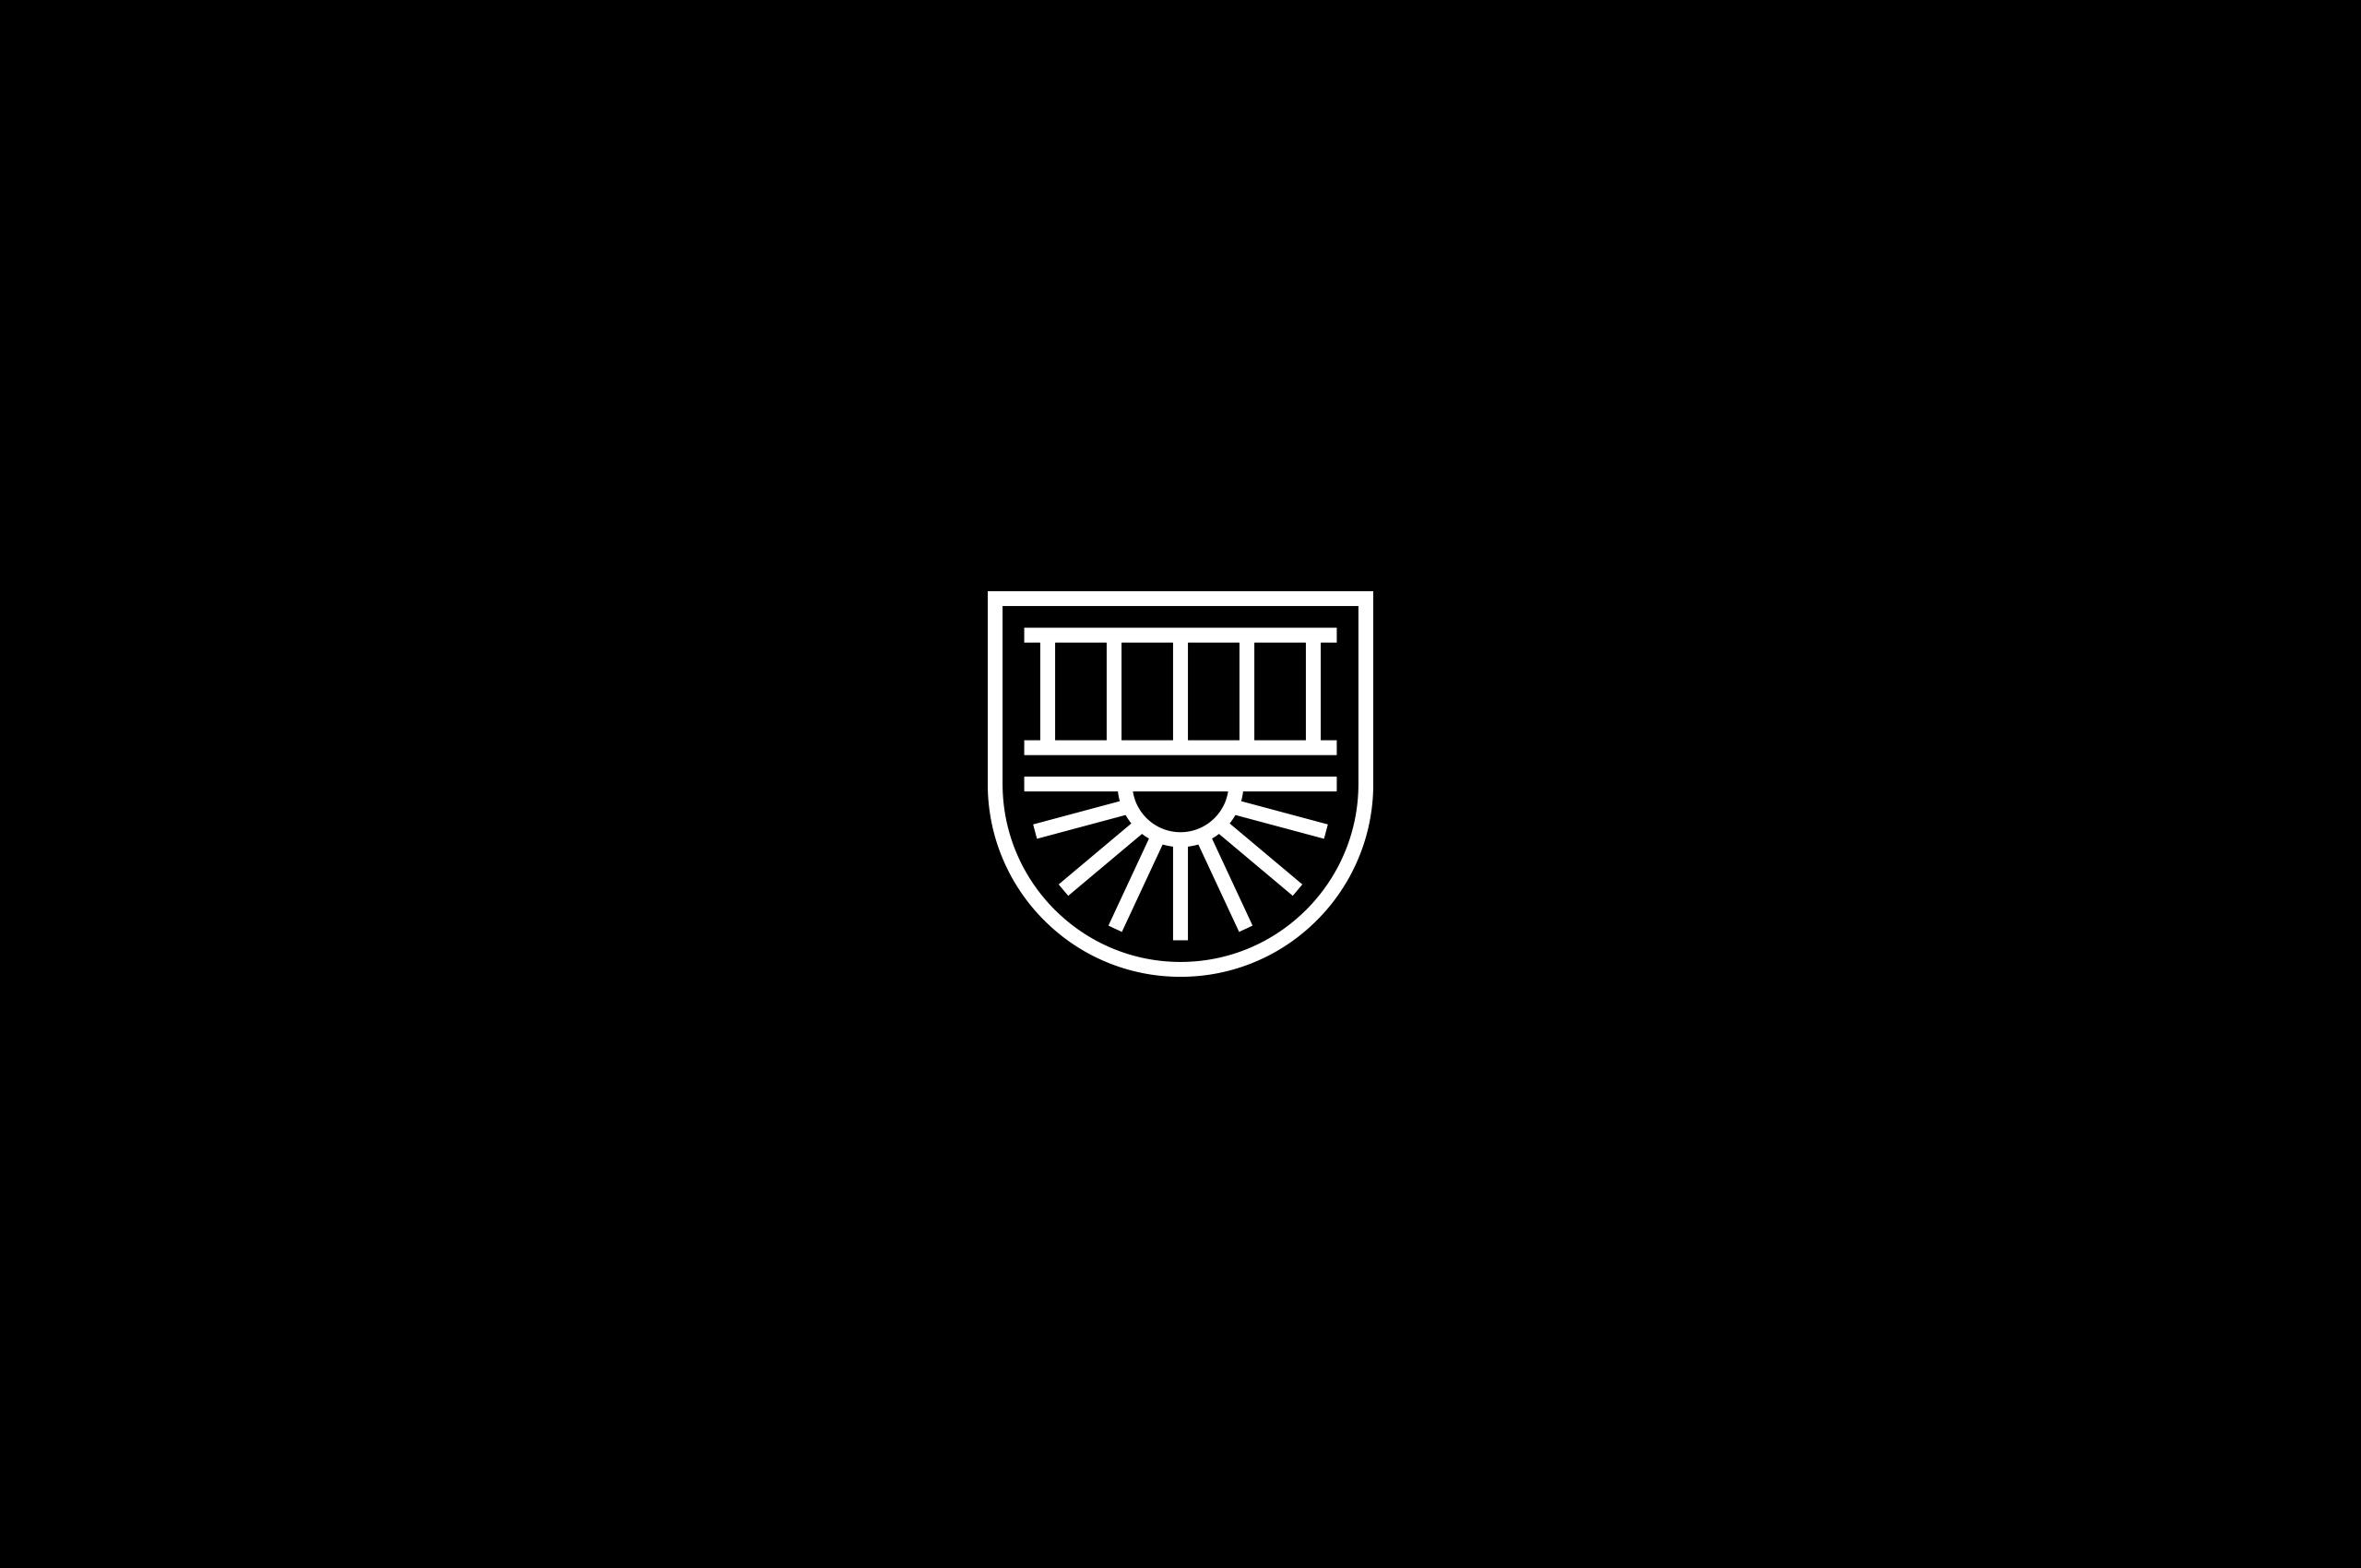 logo-9-black